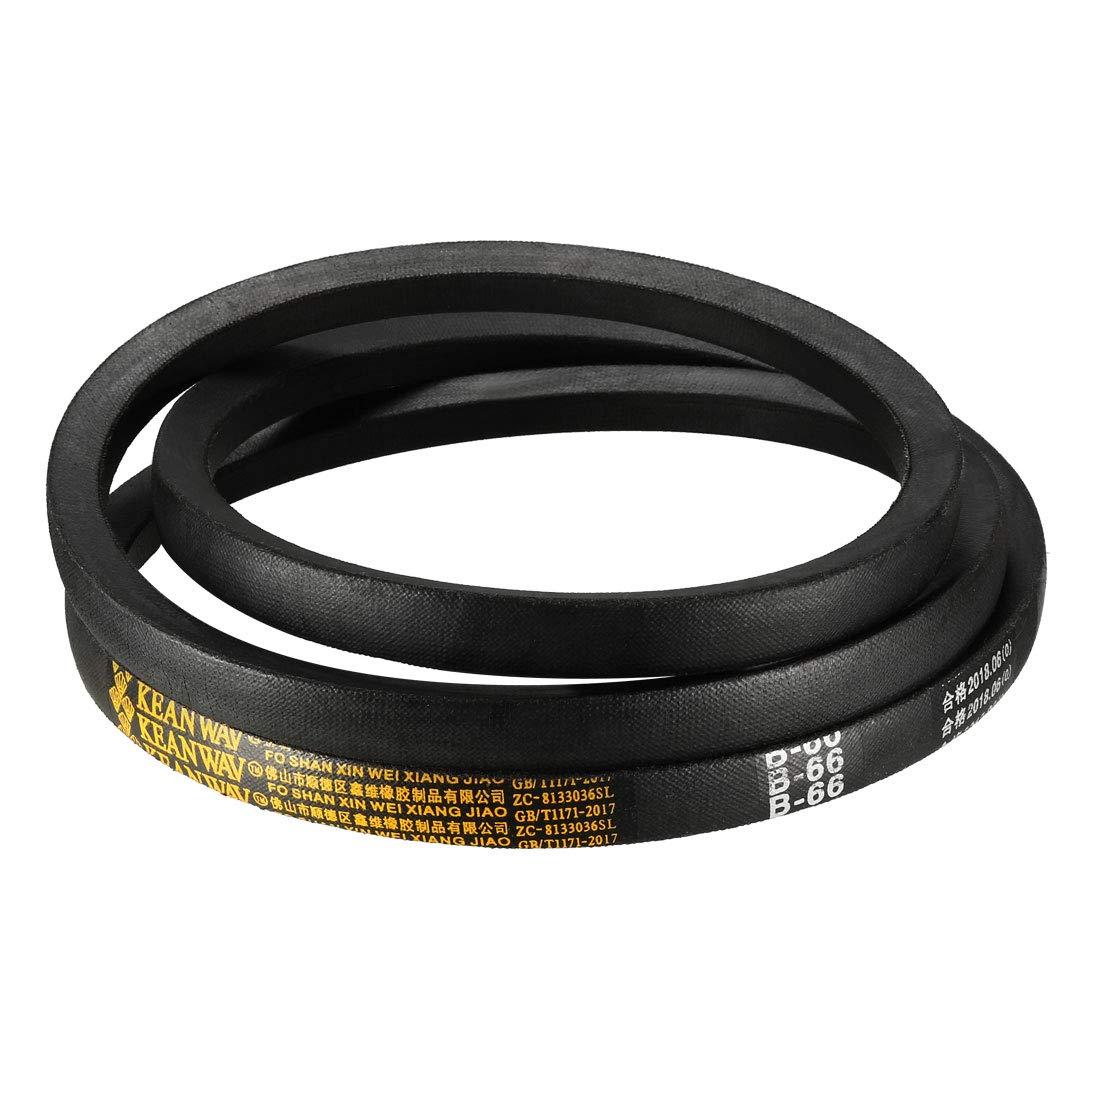 uxcell/® B70 Drive V-Belt Girth 70-inch Industrial Power Rubber Transmission Belt